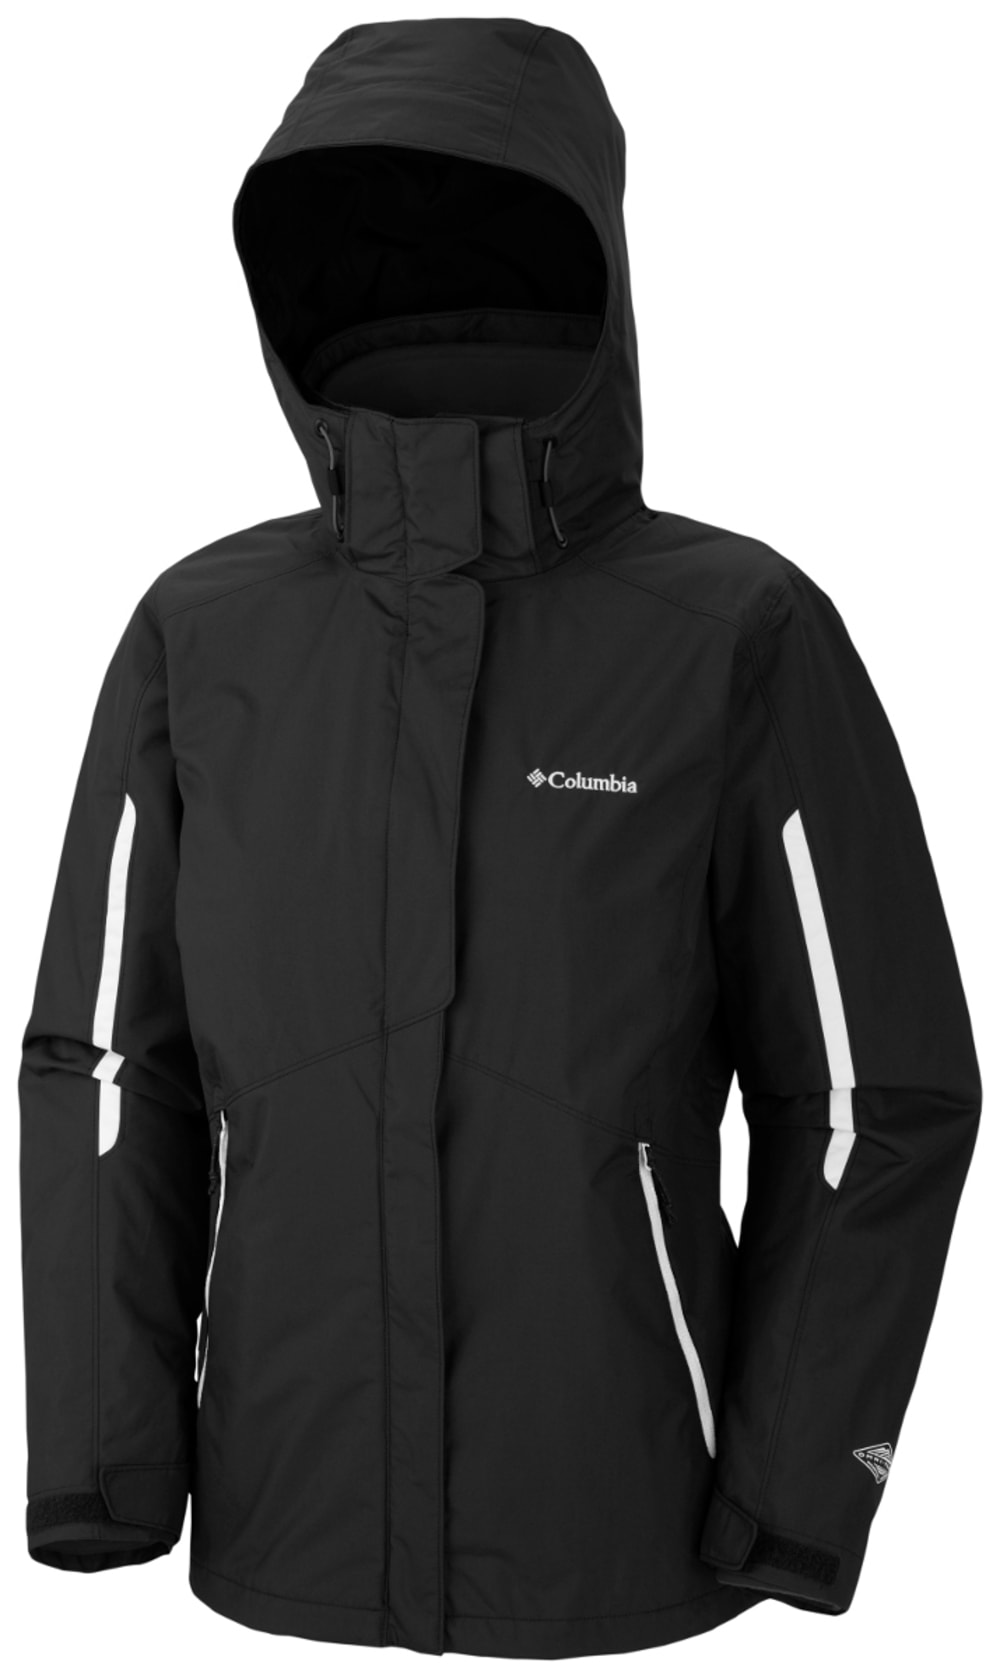 COLUMBIA Women's Bugaboo Interchange Jacket - 010-BLACK/WHITE